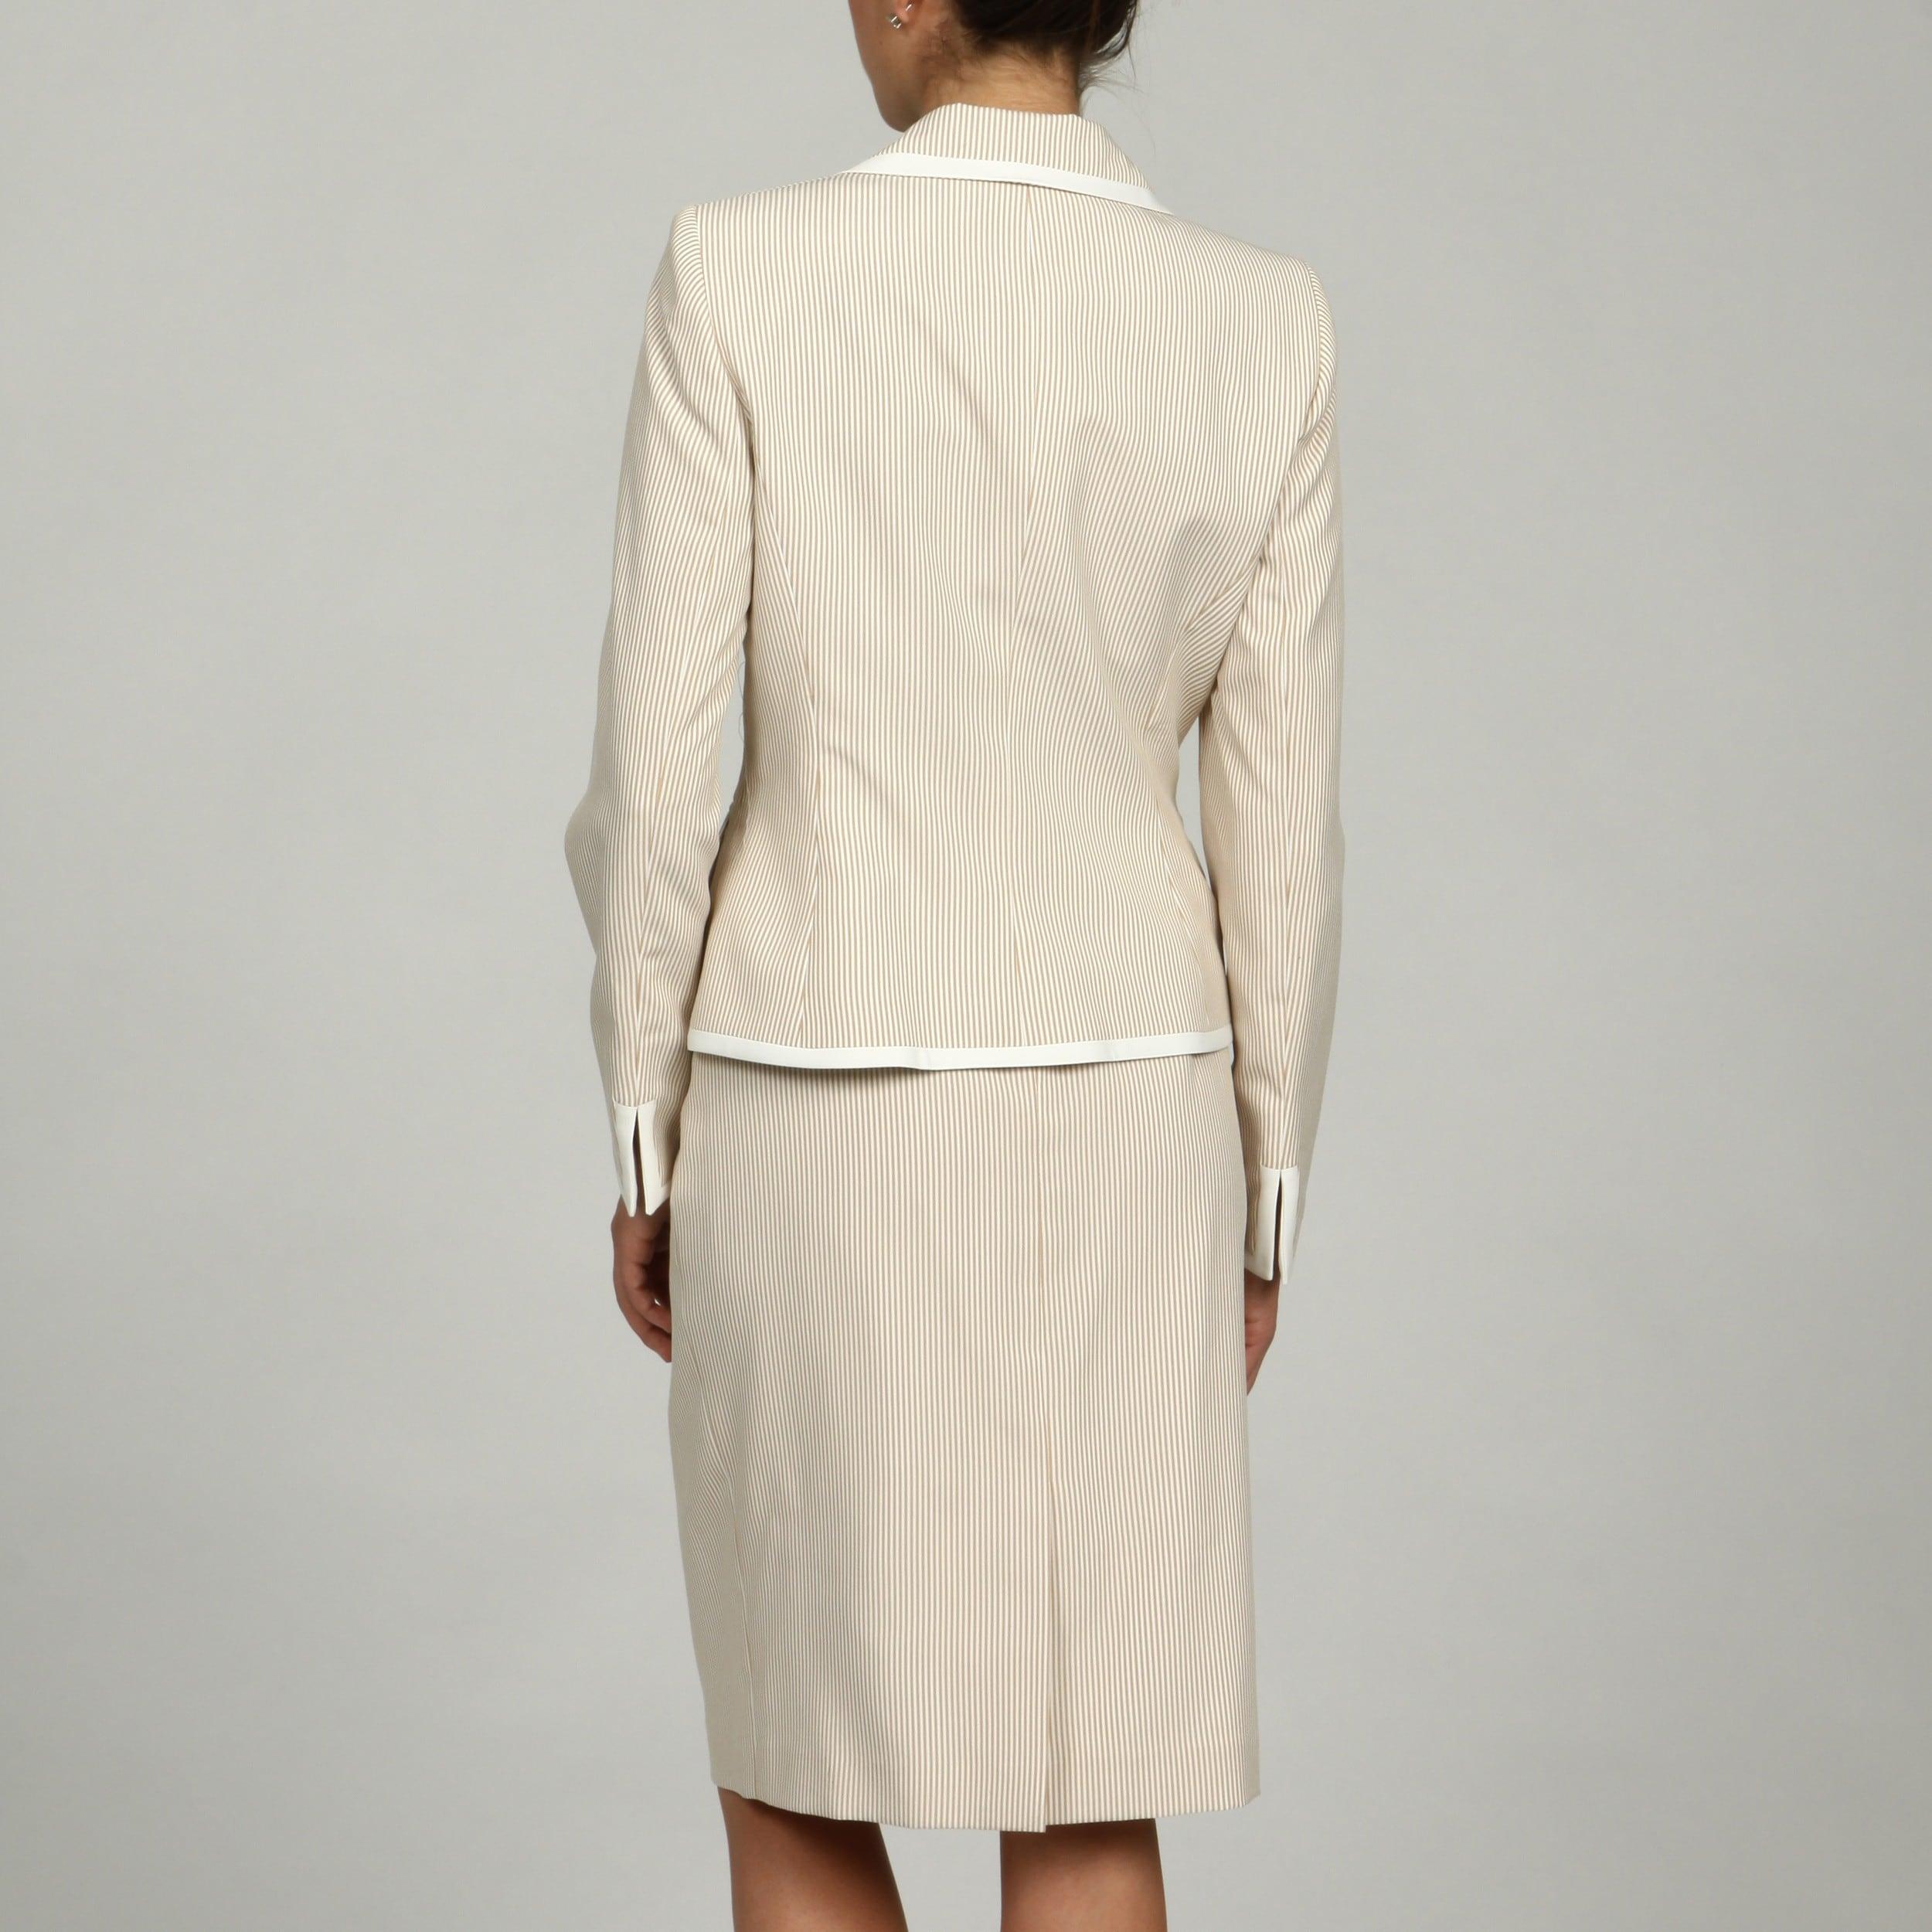 Shop Evan Picone Women S Striped Seersicker Skirt Suit Free